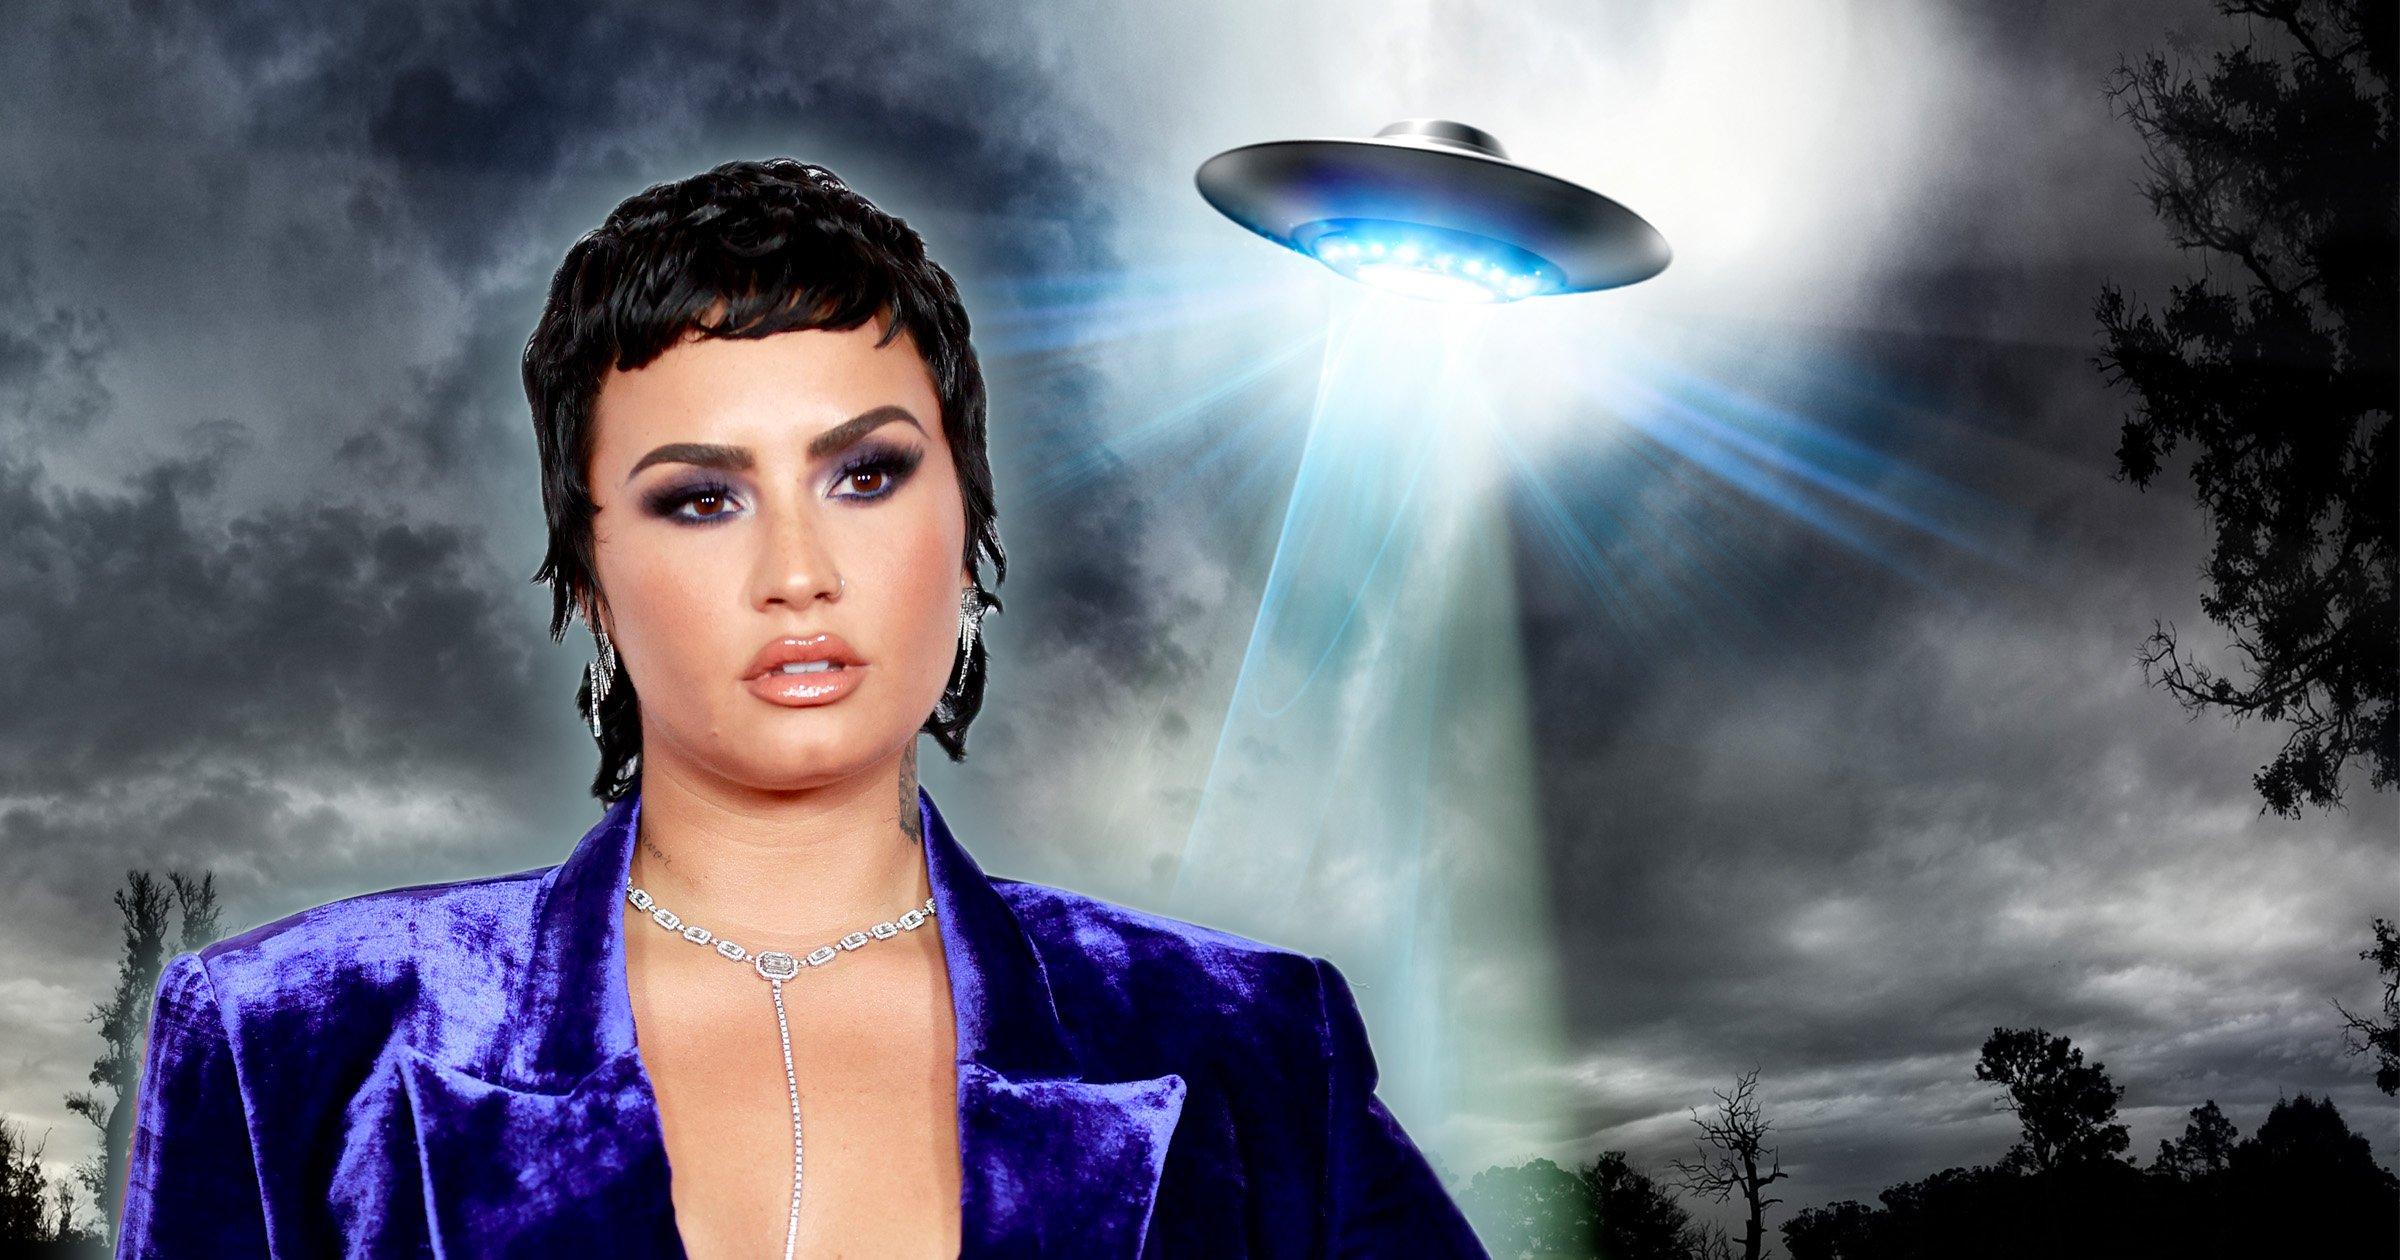 Demi Lovato; Demi Lovato levanta polémica al decirque llamar 'aliens' a los extraterrestres es 'despectivo'